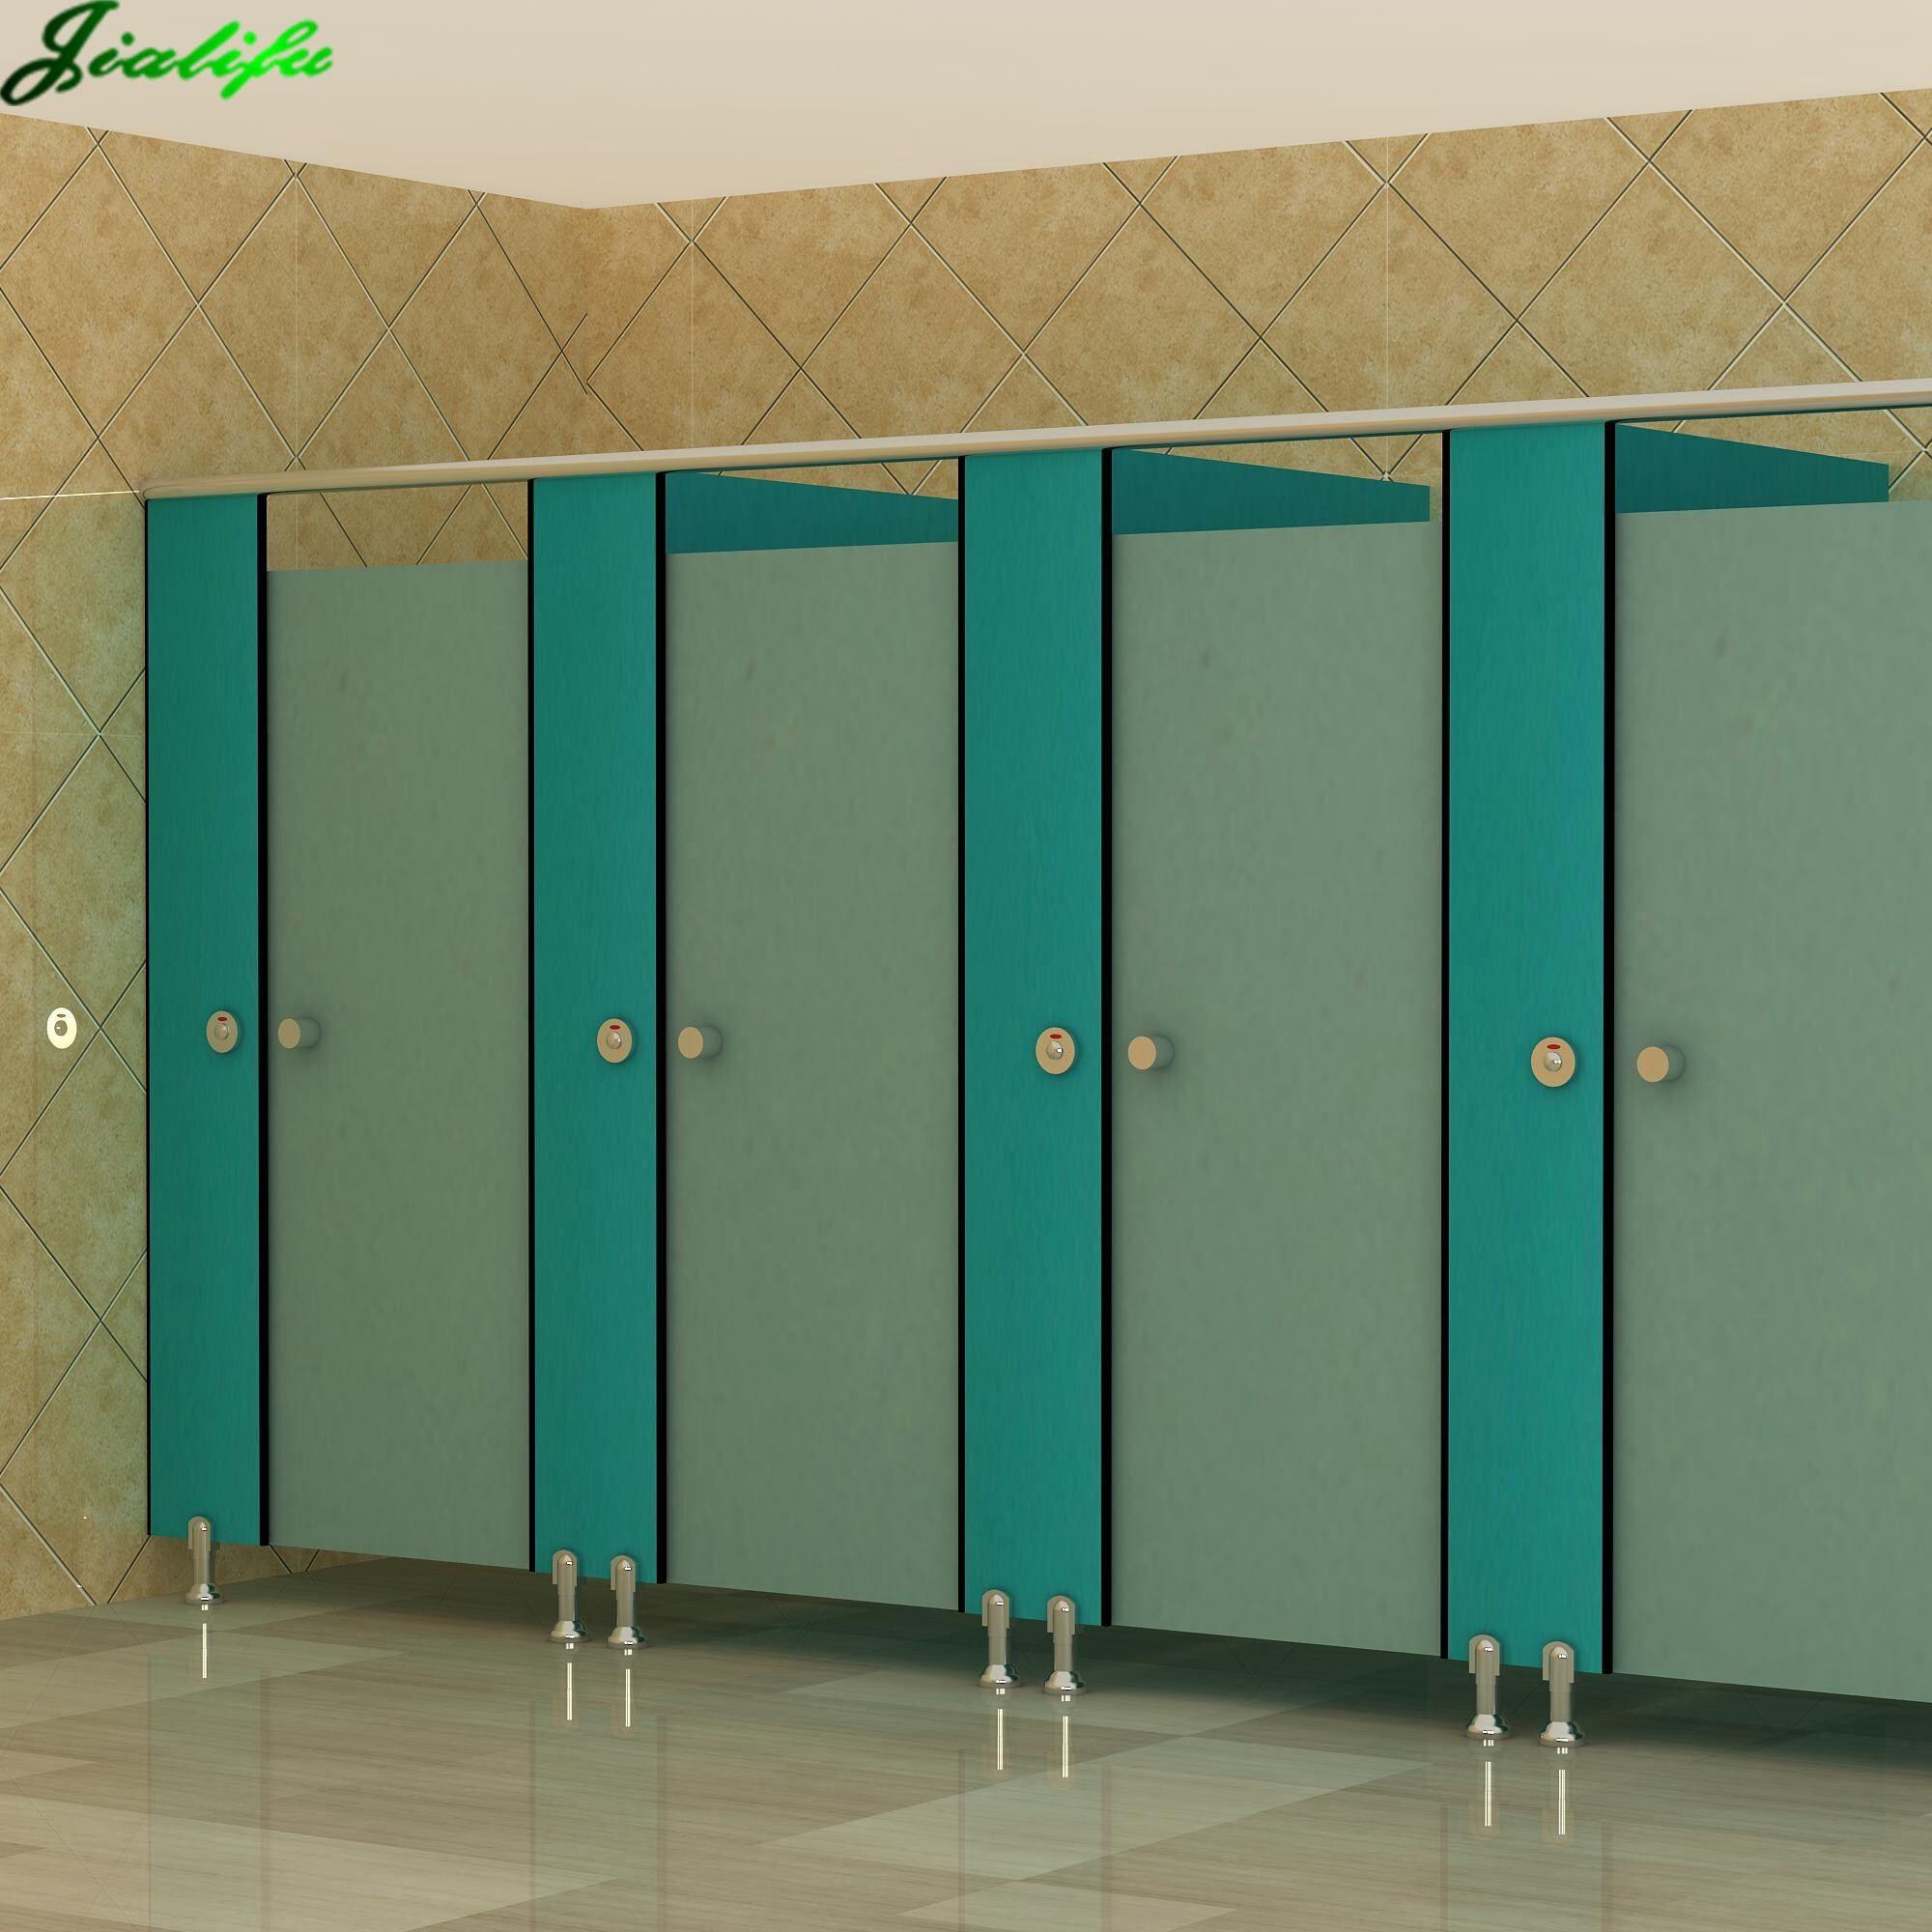 Bathroom Stall Partitions bathroom partition glass india | ideas | pinterest | bathroom